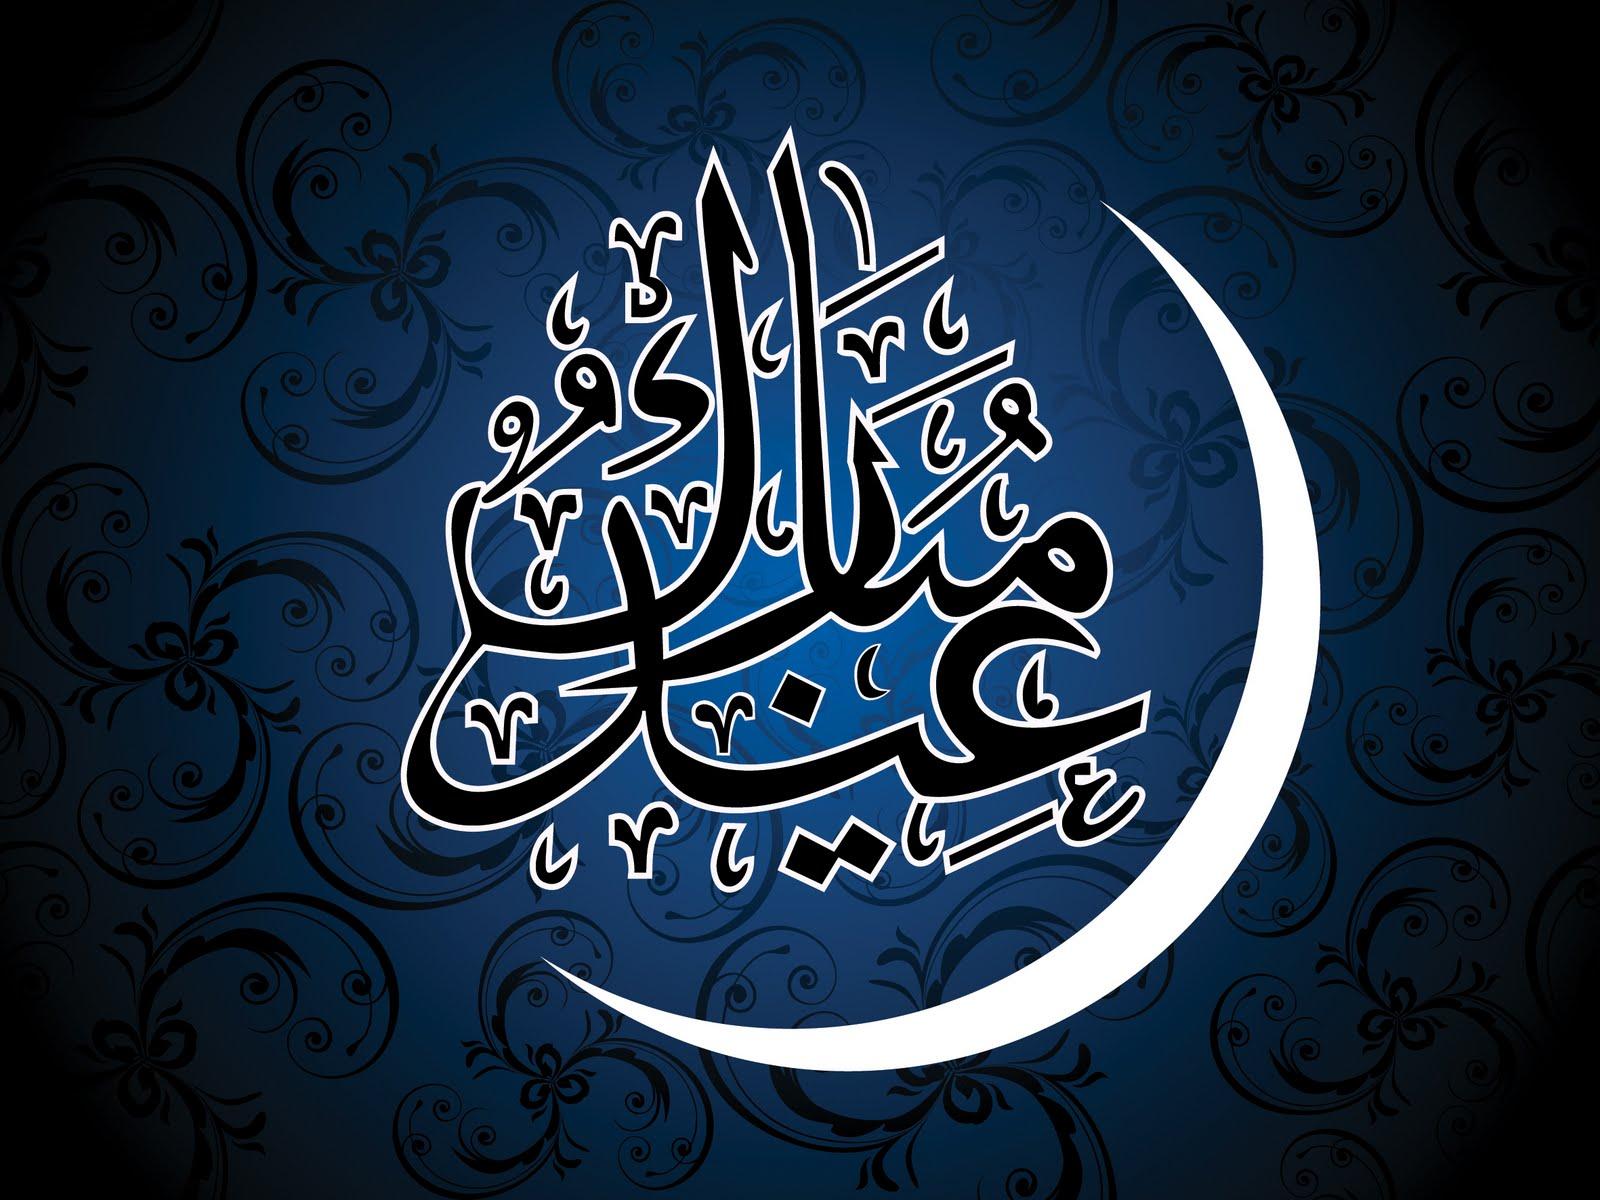 بالصور صور لعيد الفطر , رحب بالعيد وخليه غير مع هذه الصور 484 9